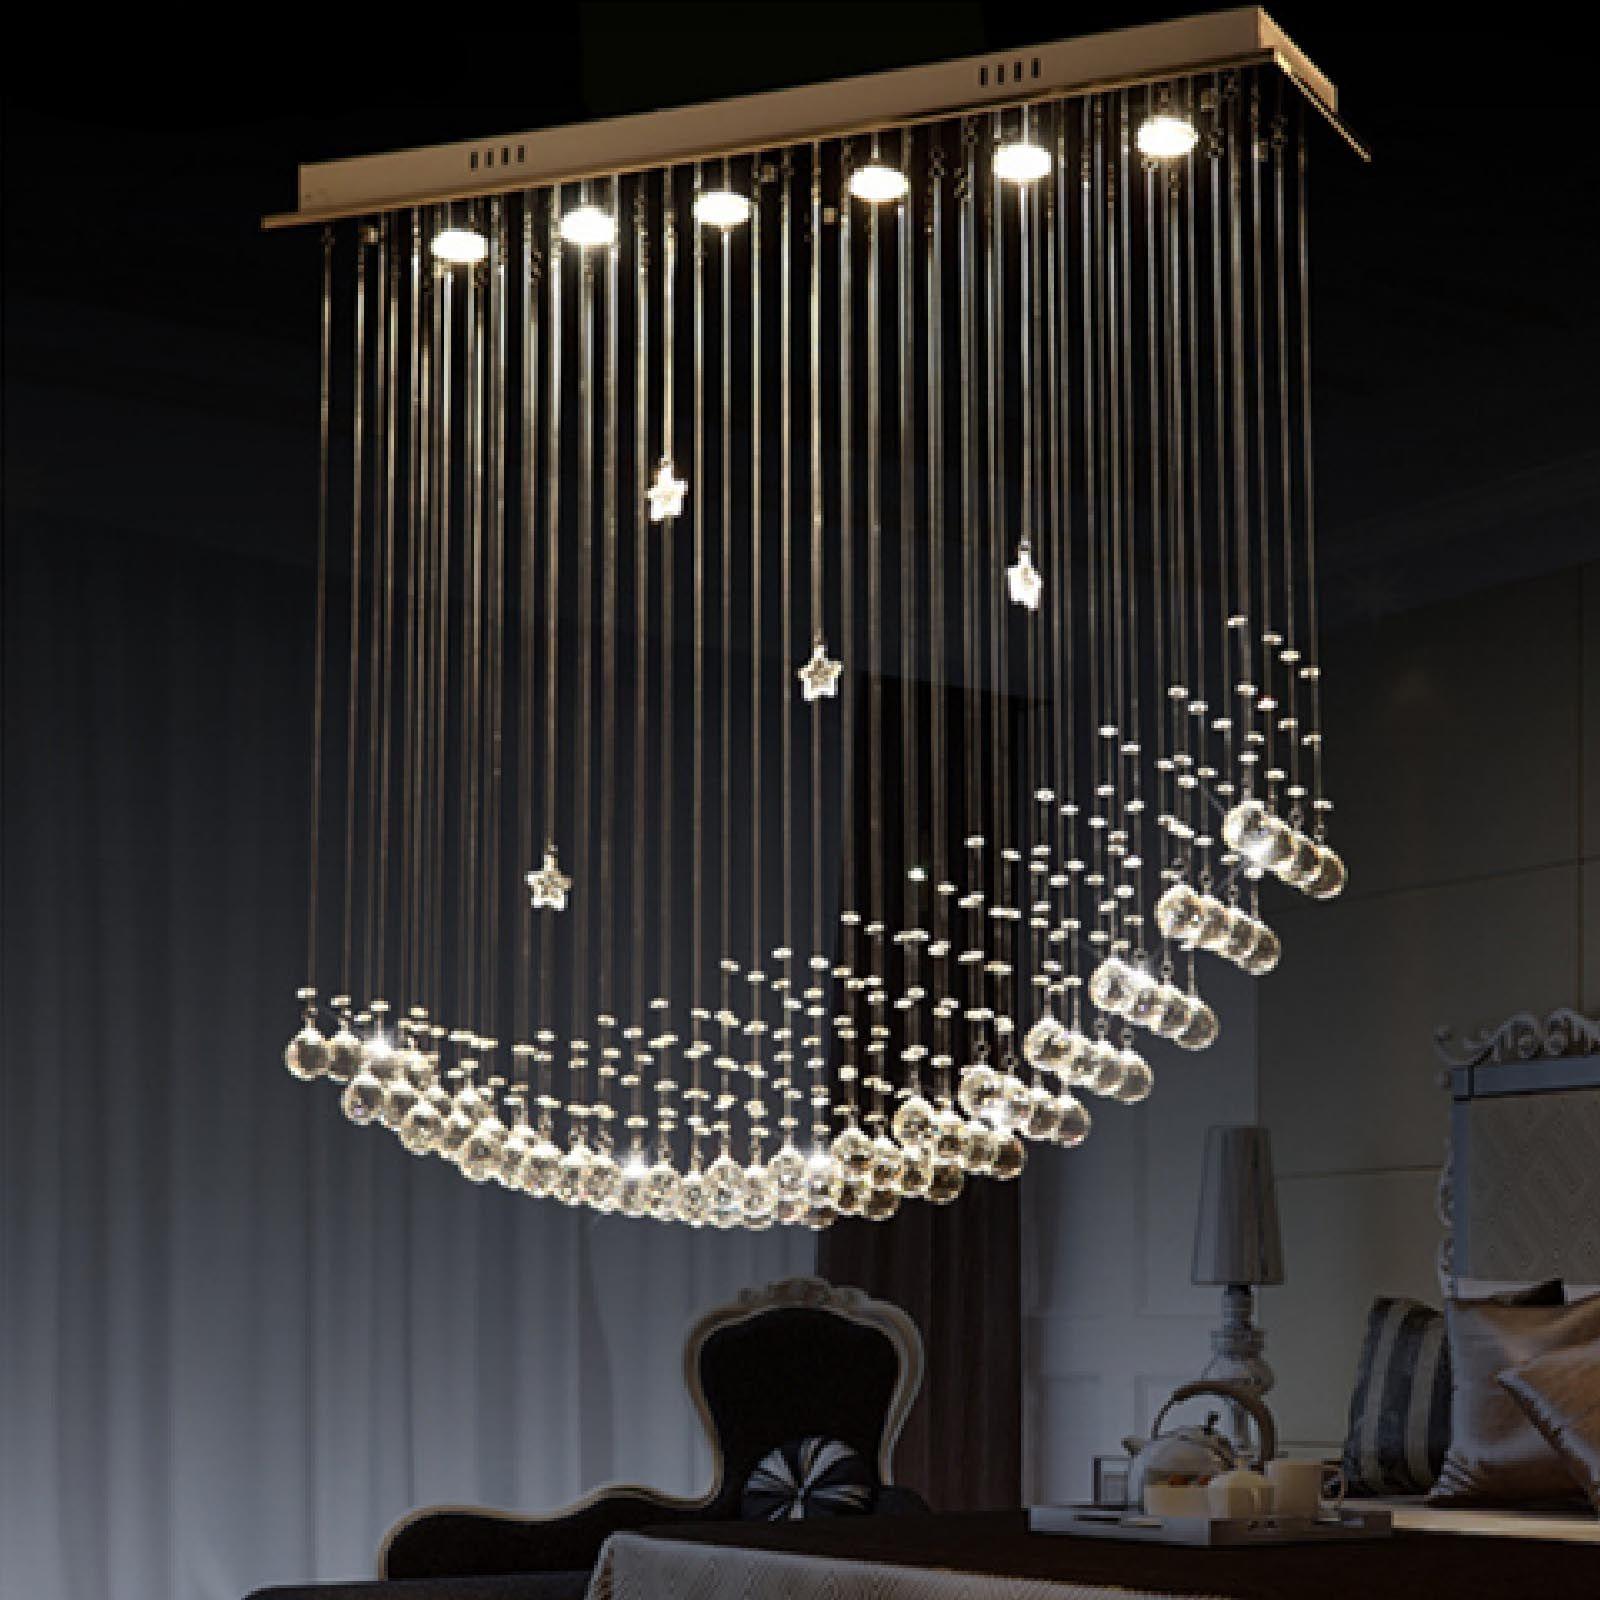 Byb Modern Chandelier Rain Drop Lighting Crystal Ball Fixture Pendant Ceiling Lamp Moon